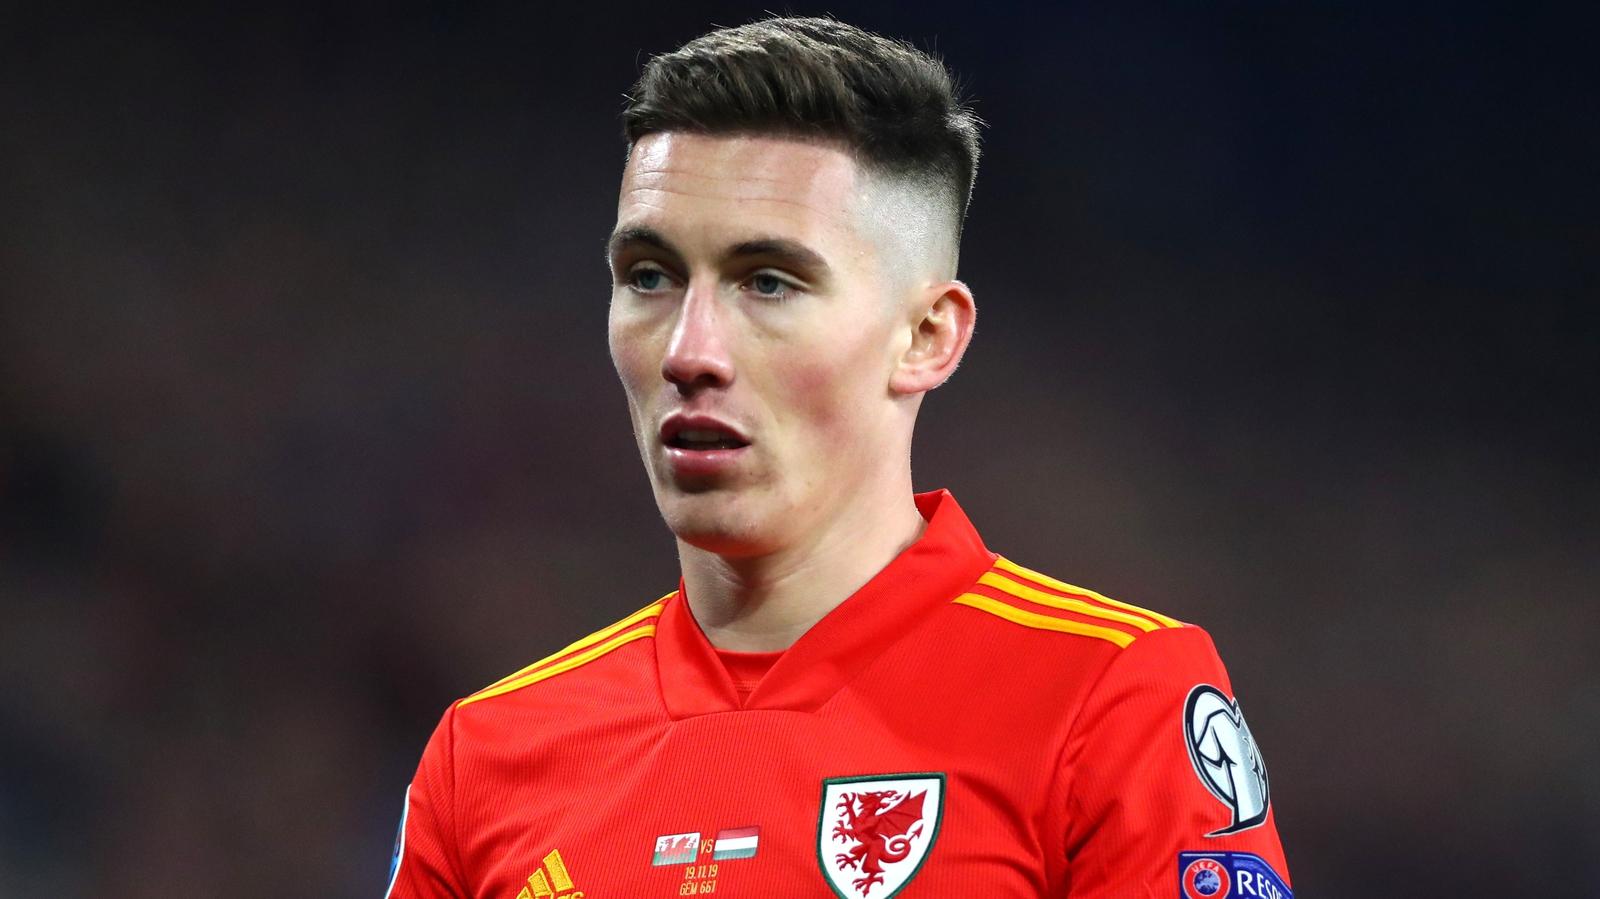 Burnley closing on Liverpool's Harry Wilson